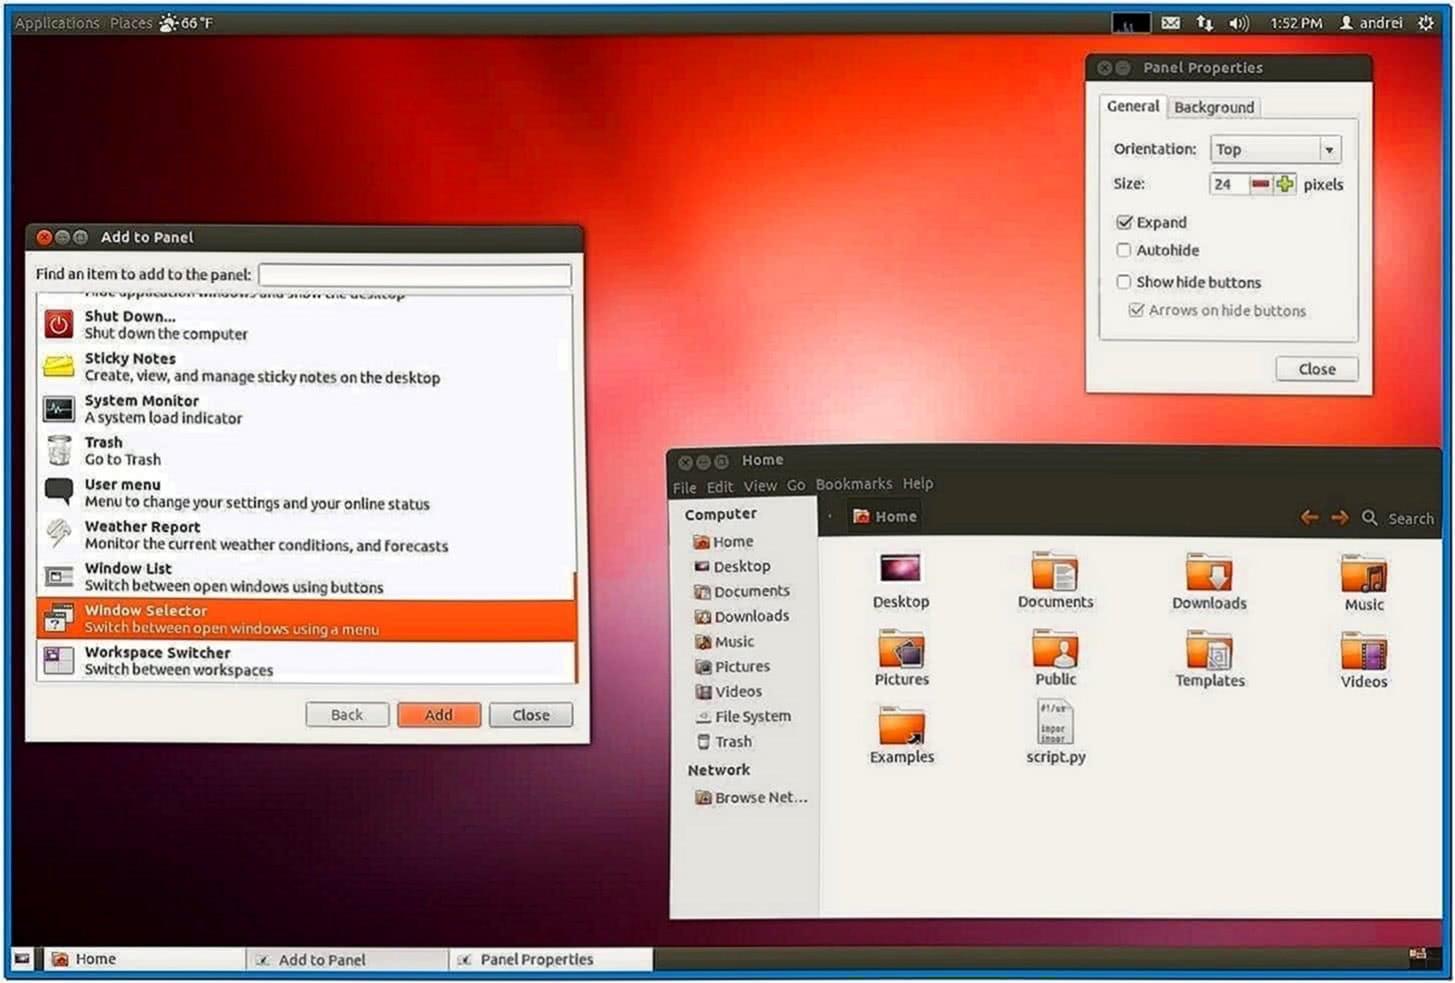 Ubuntu 12.04 gnome shell screensaver